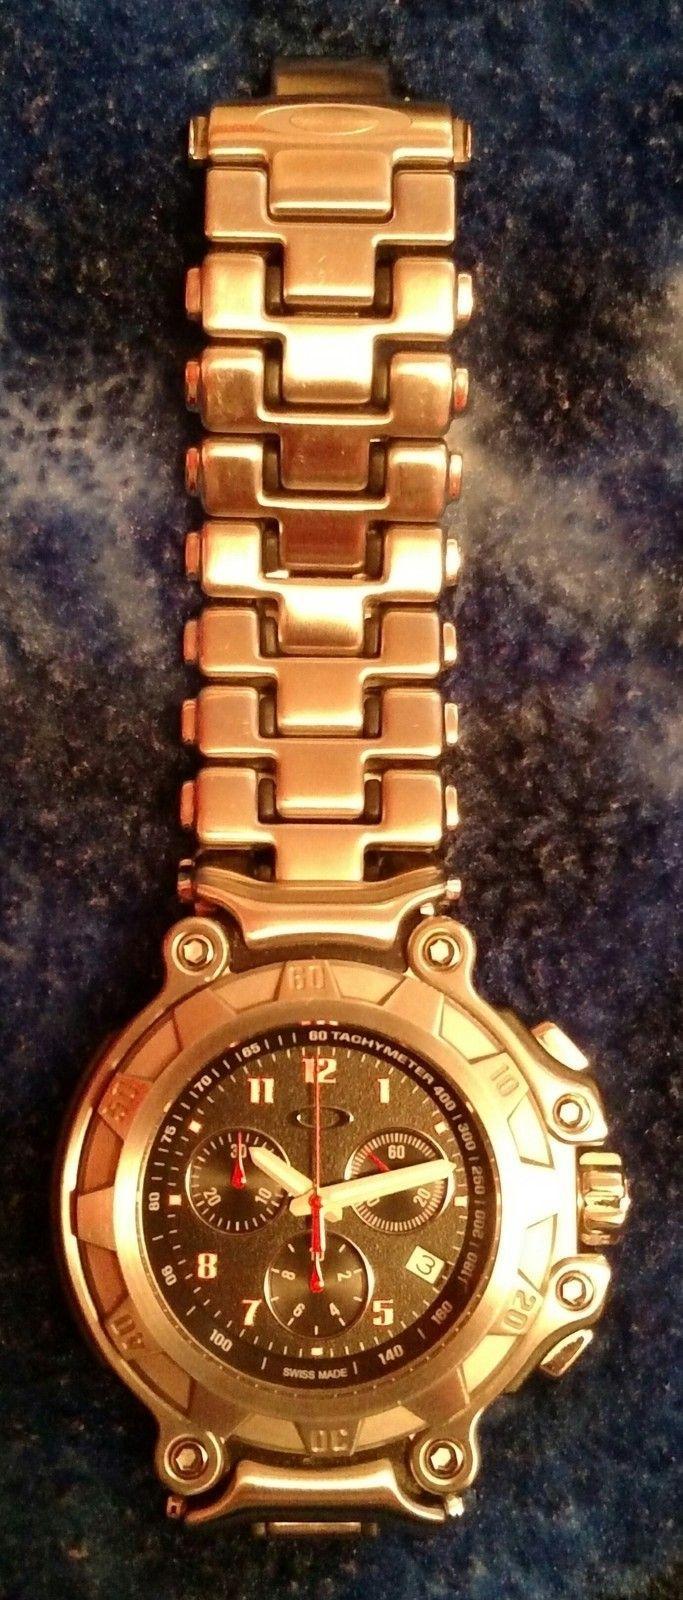 6 Hand Crankcase Watch - uploadfromtaptalk1422976711000.jpg